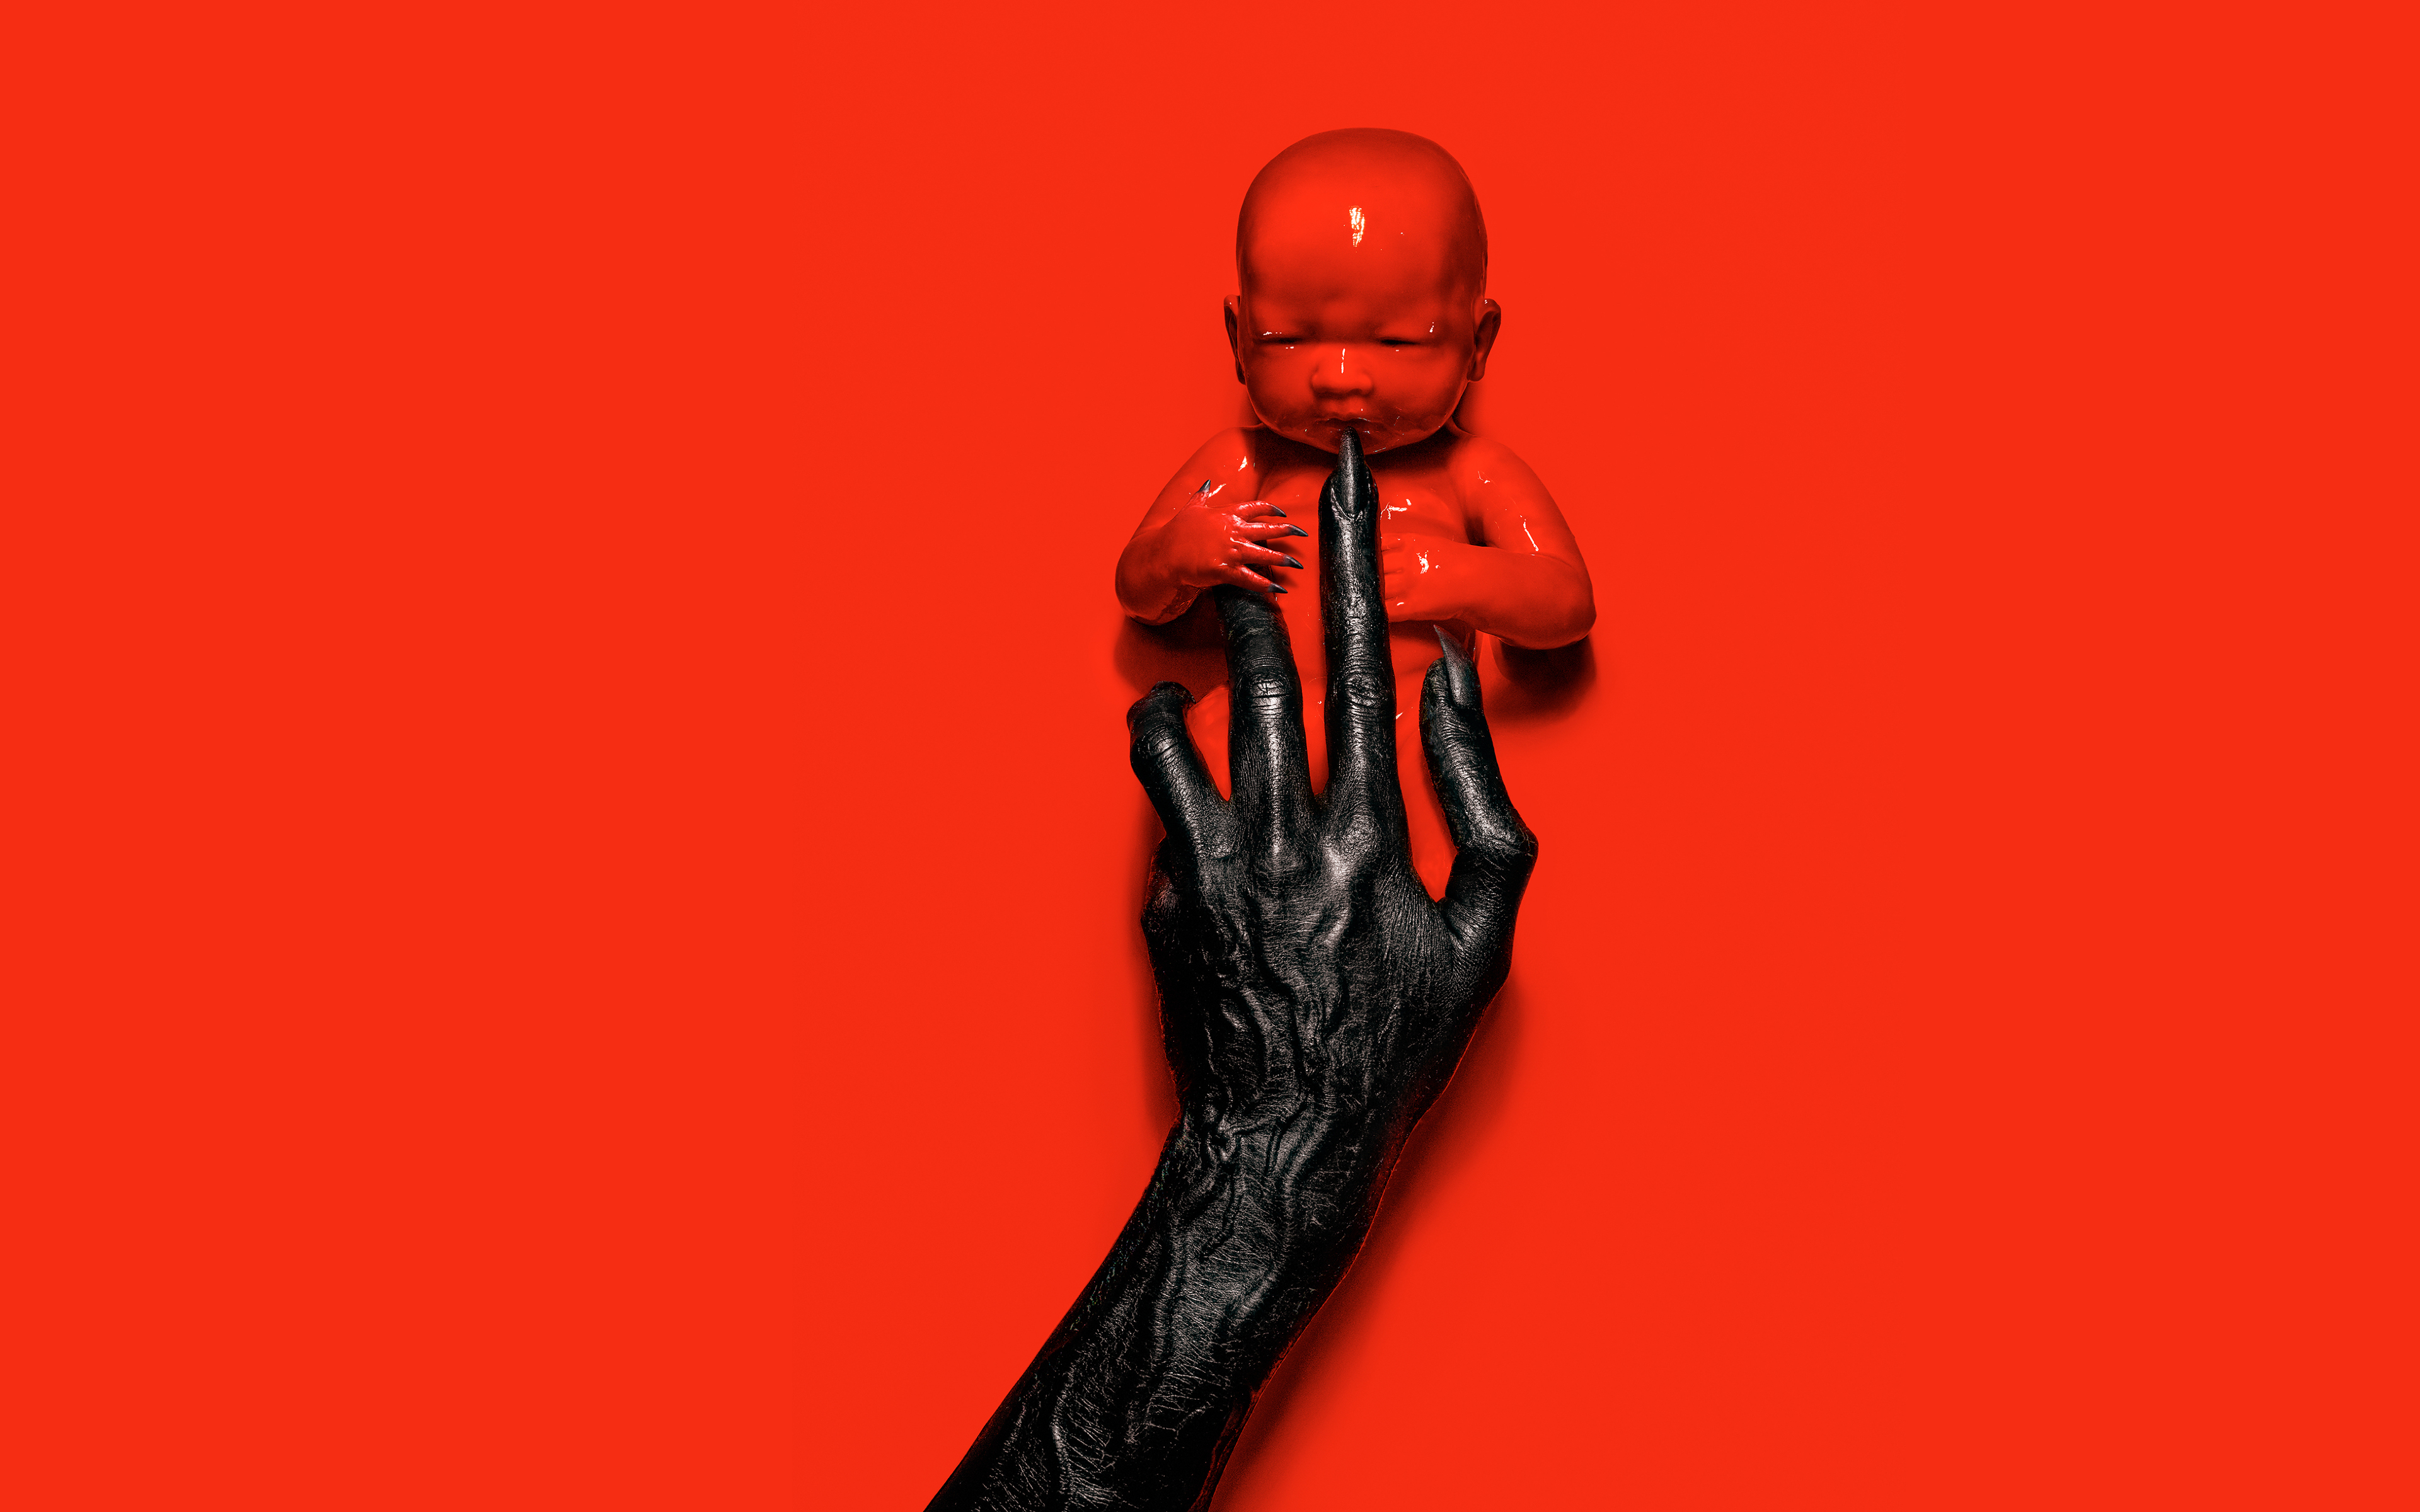 3840x2400 American Horror Story Apocalypse Season 8 Poster 4k